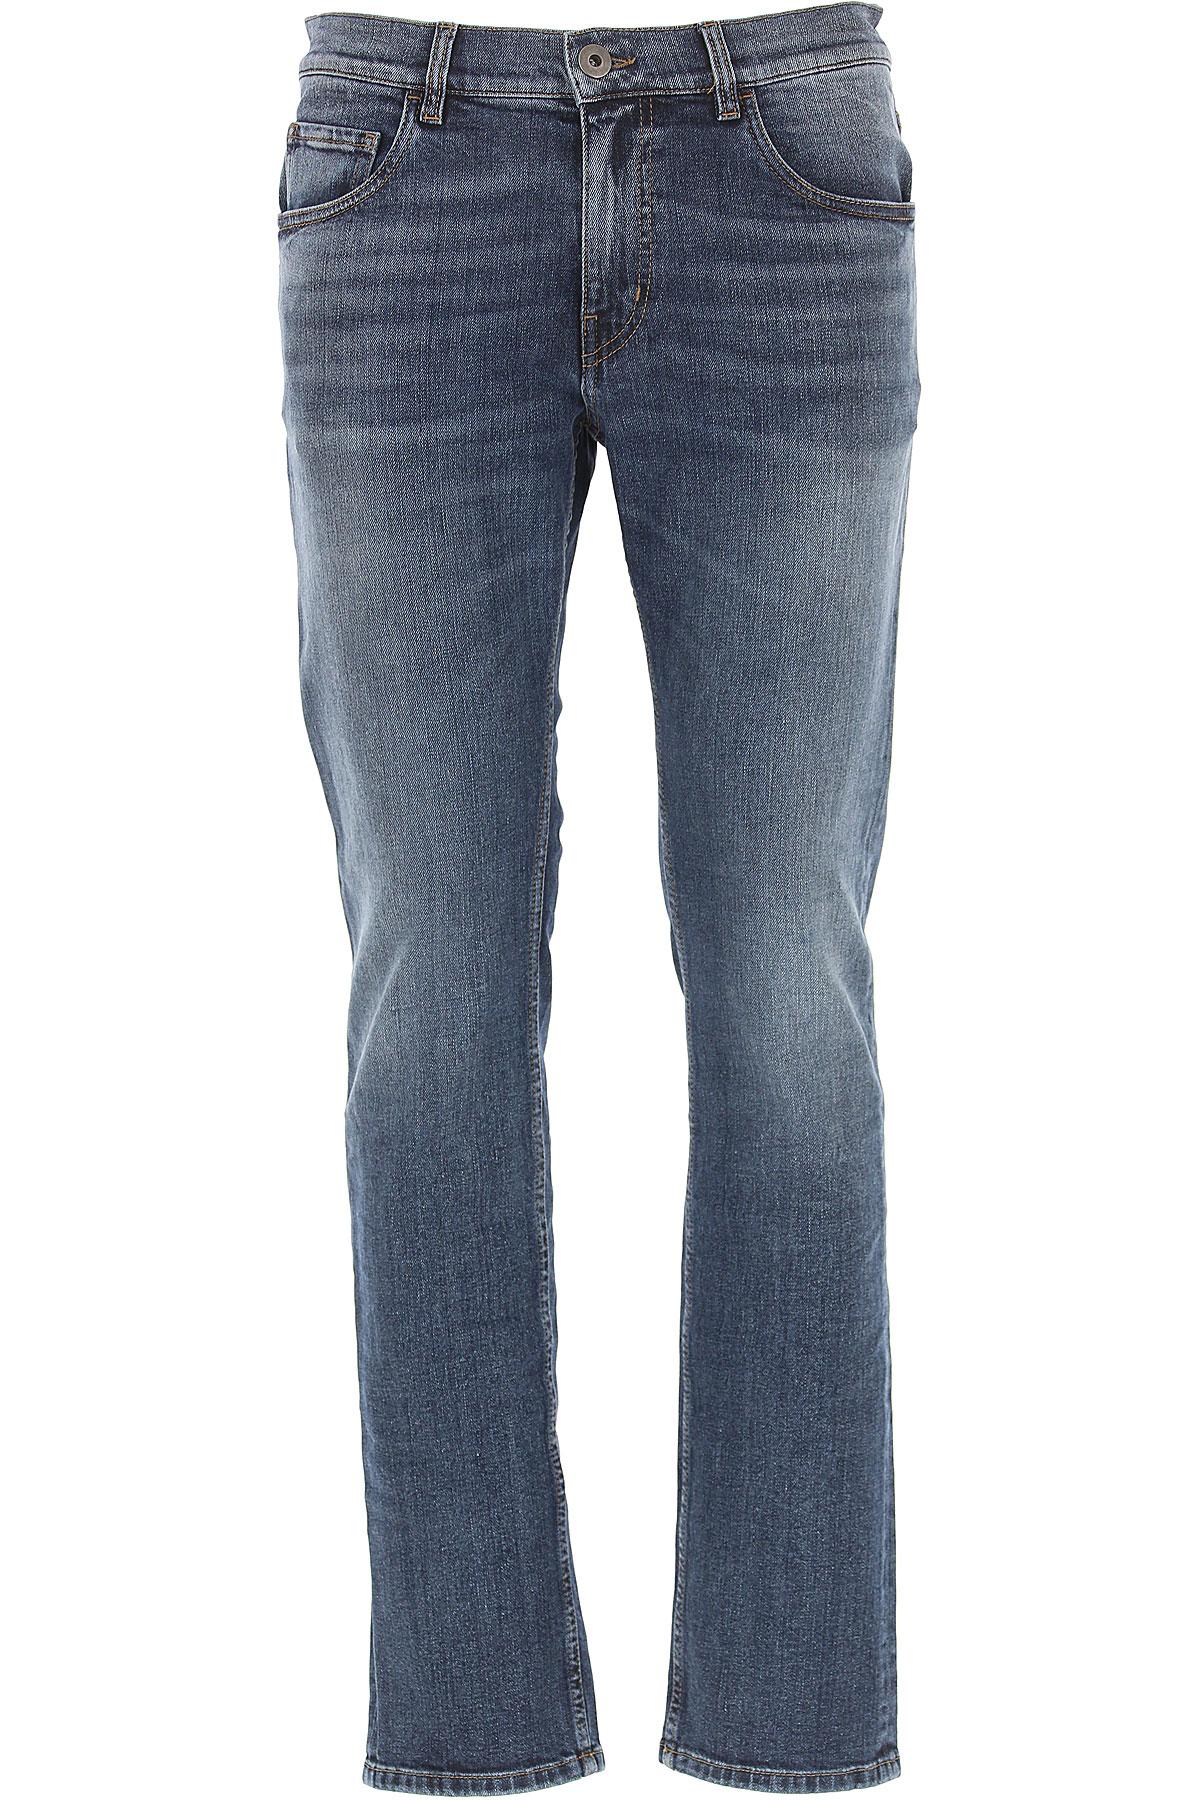 Prada Jeans, Denim Blue, Cotton, 2017, 31 35 36 38